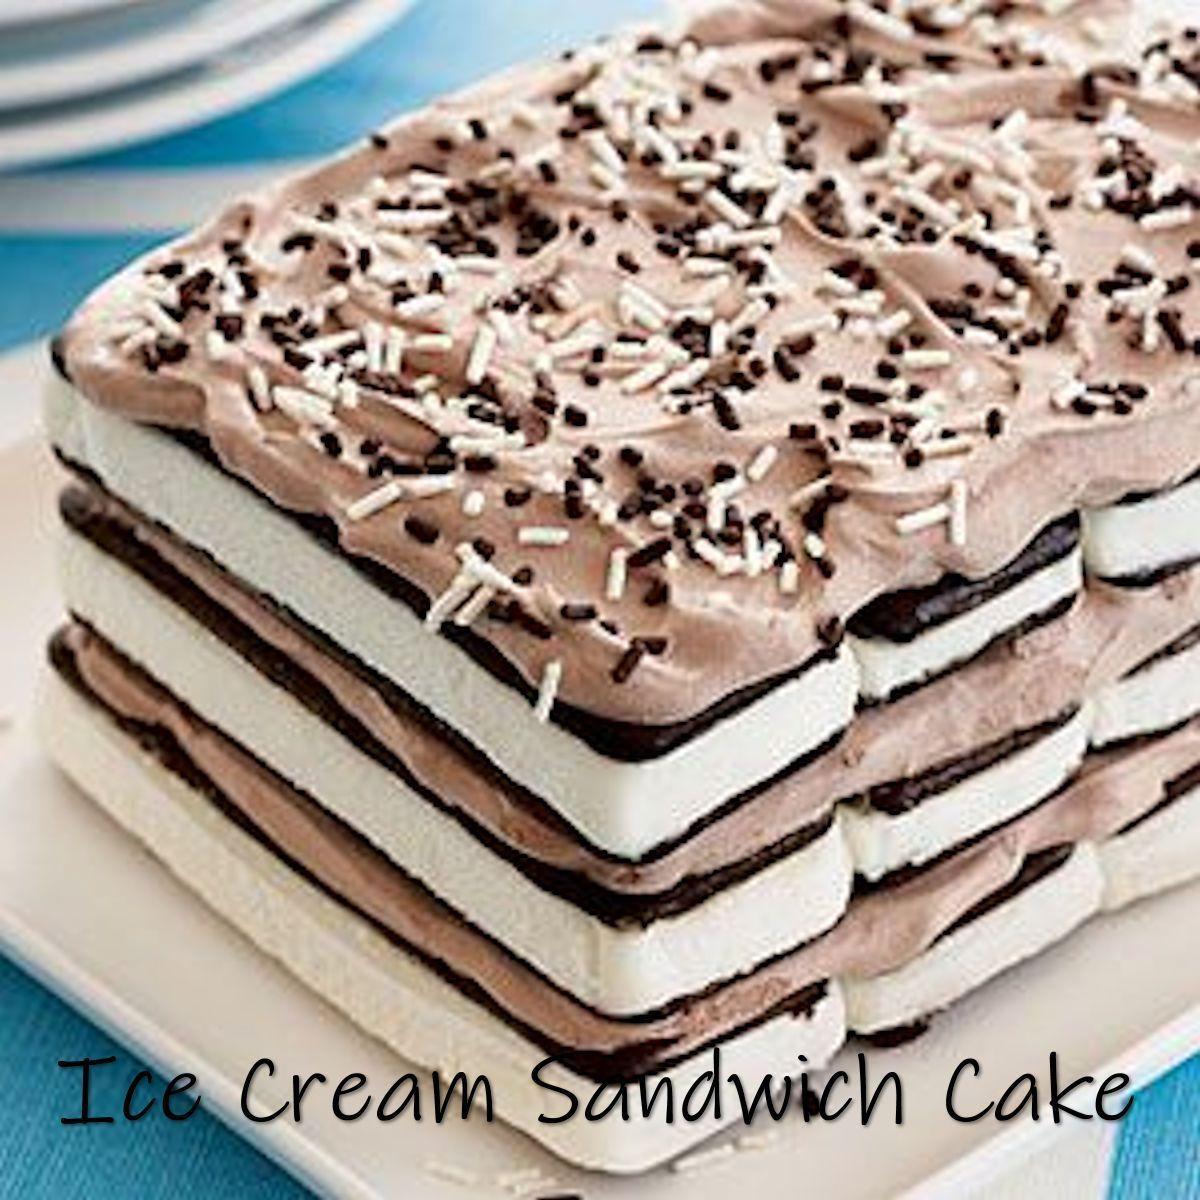 Ice Cream Sandwich Cake #icecreamsandwich Ice Cream Sandwich Cake | The Belly Ru...